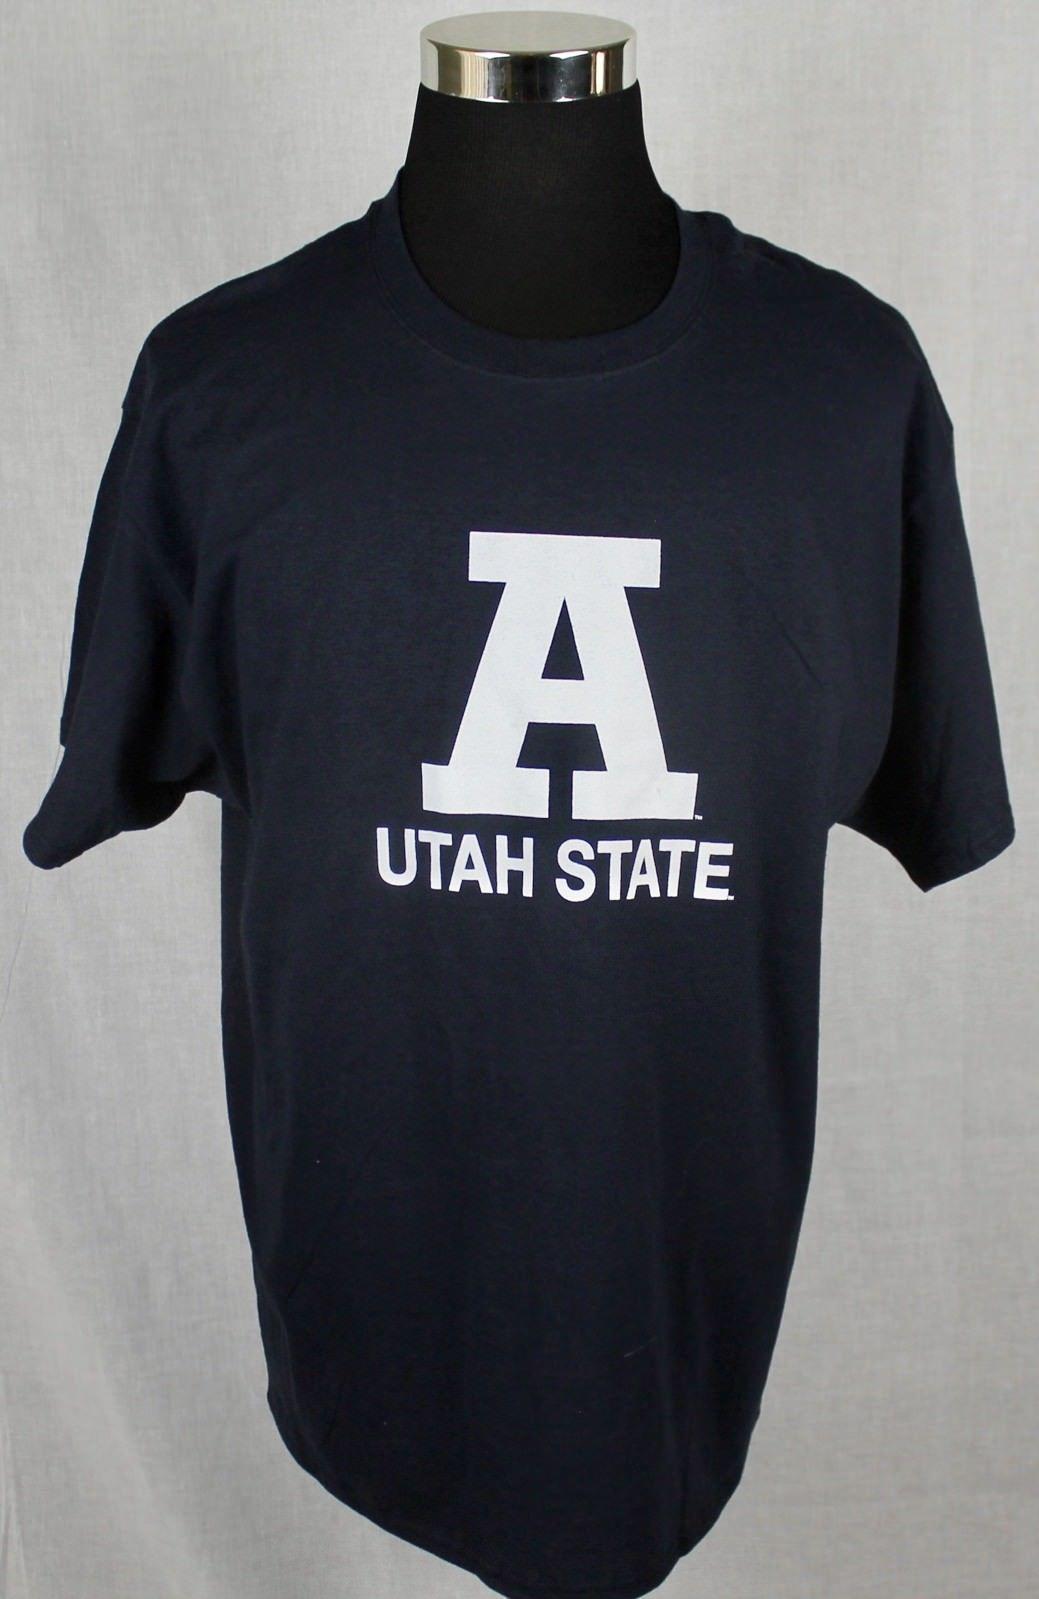 Champion Utah State Mens Short Sleeve T-Shirt sz XL Blue